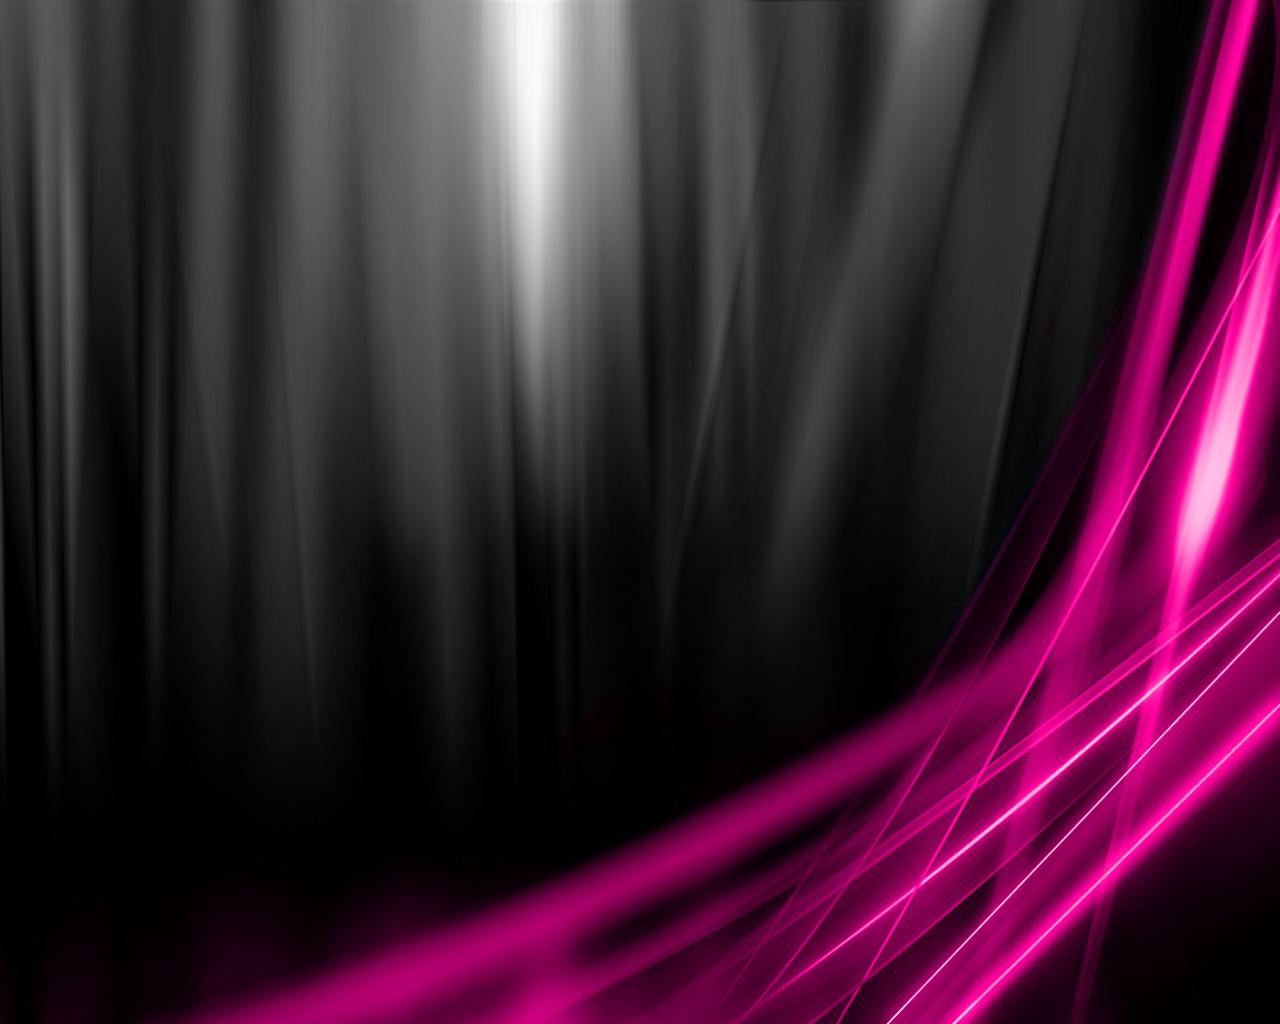 pink wallpaper web Black And Hot Pink Wallpaper 1280x1024